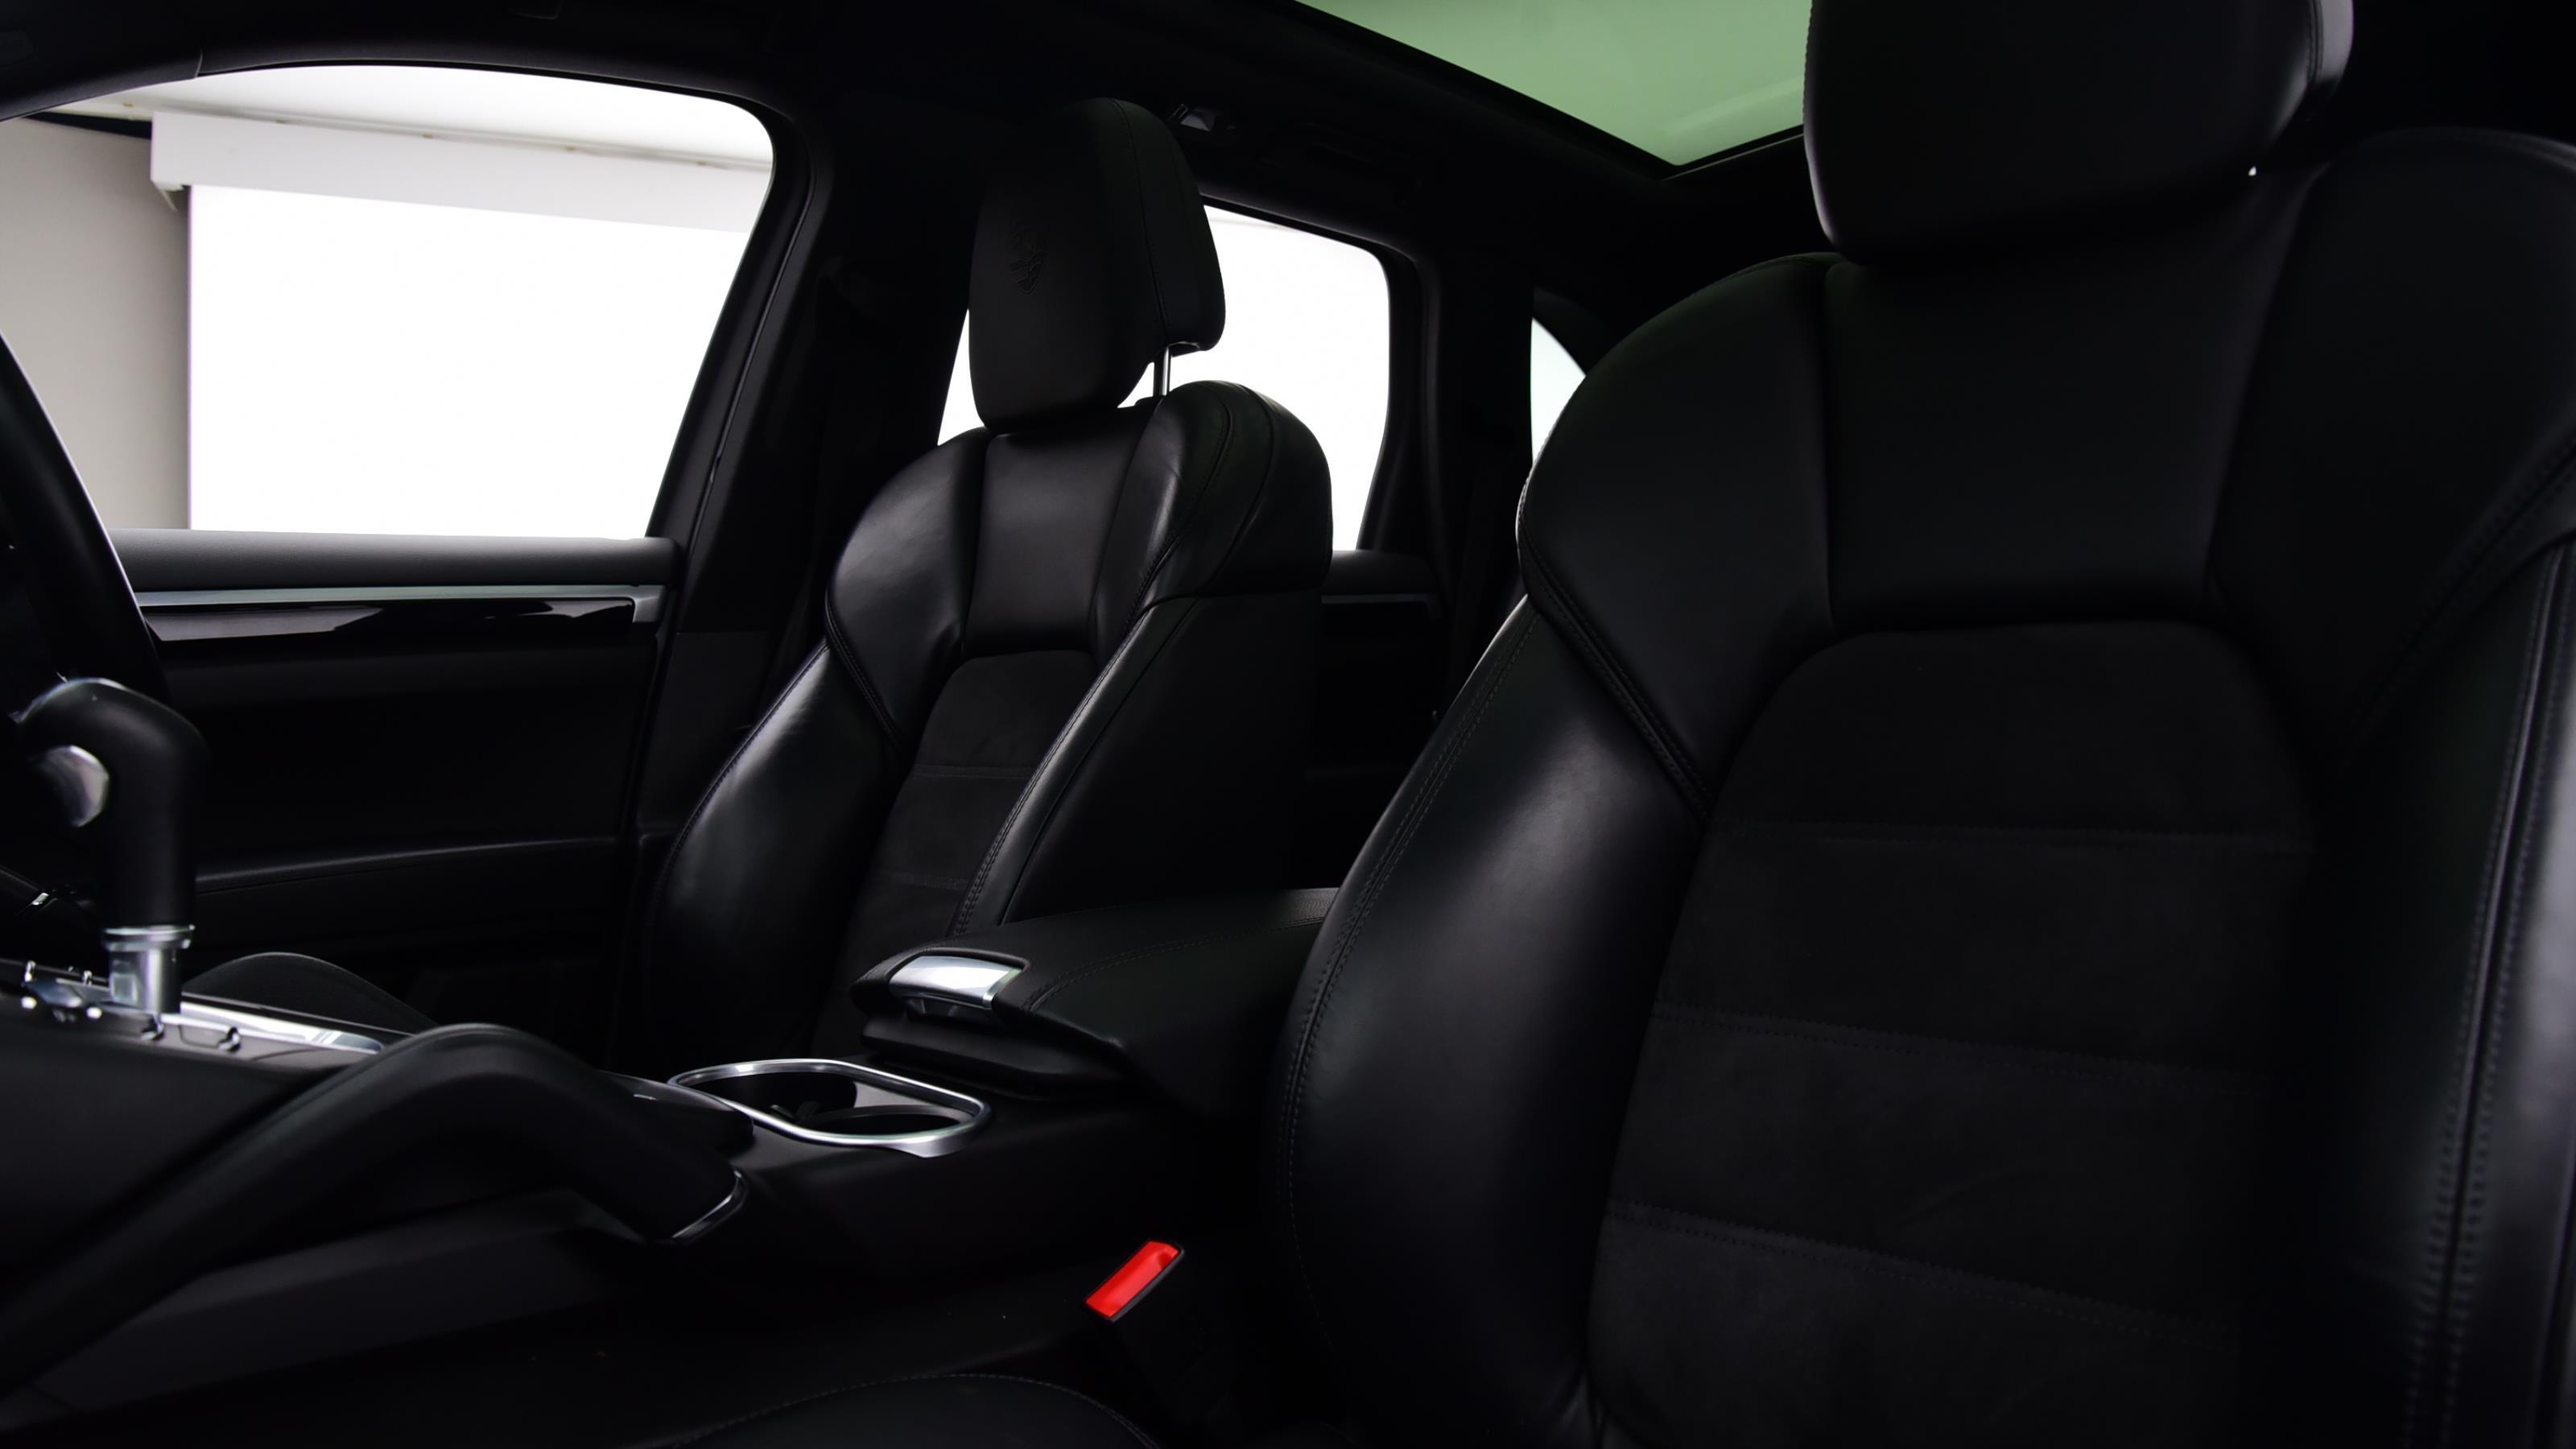 Used 2017 Porsche CAYENNE S Platinum Edition E-Hybrid 5dr Tiptronic S WHITE at Saxton4x4